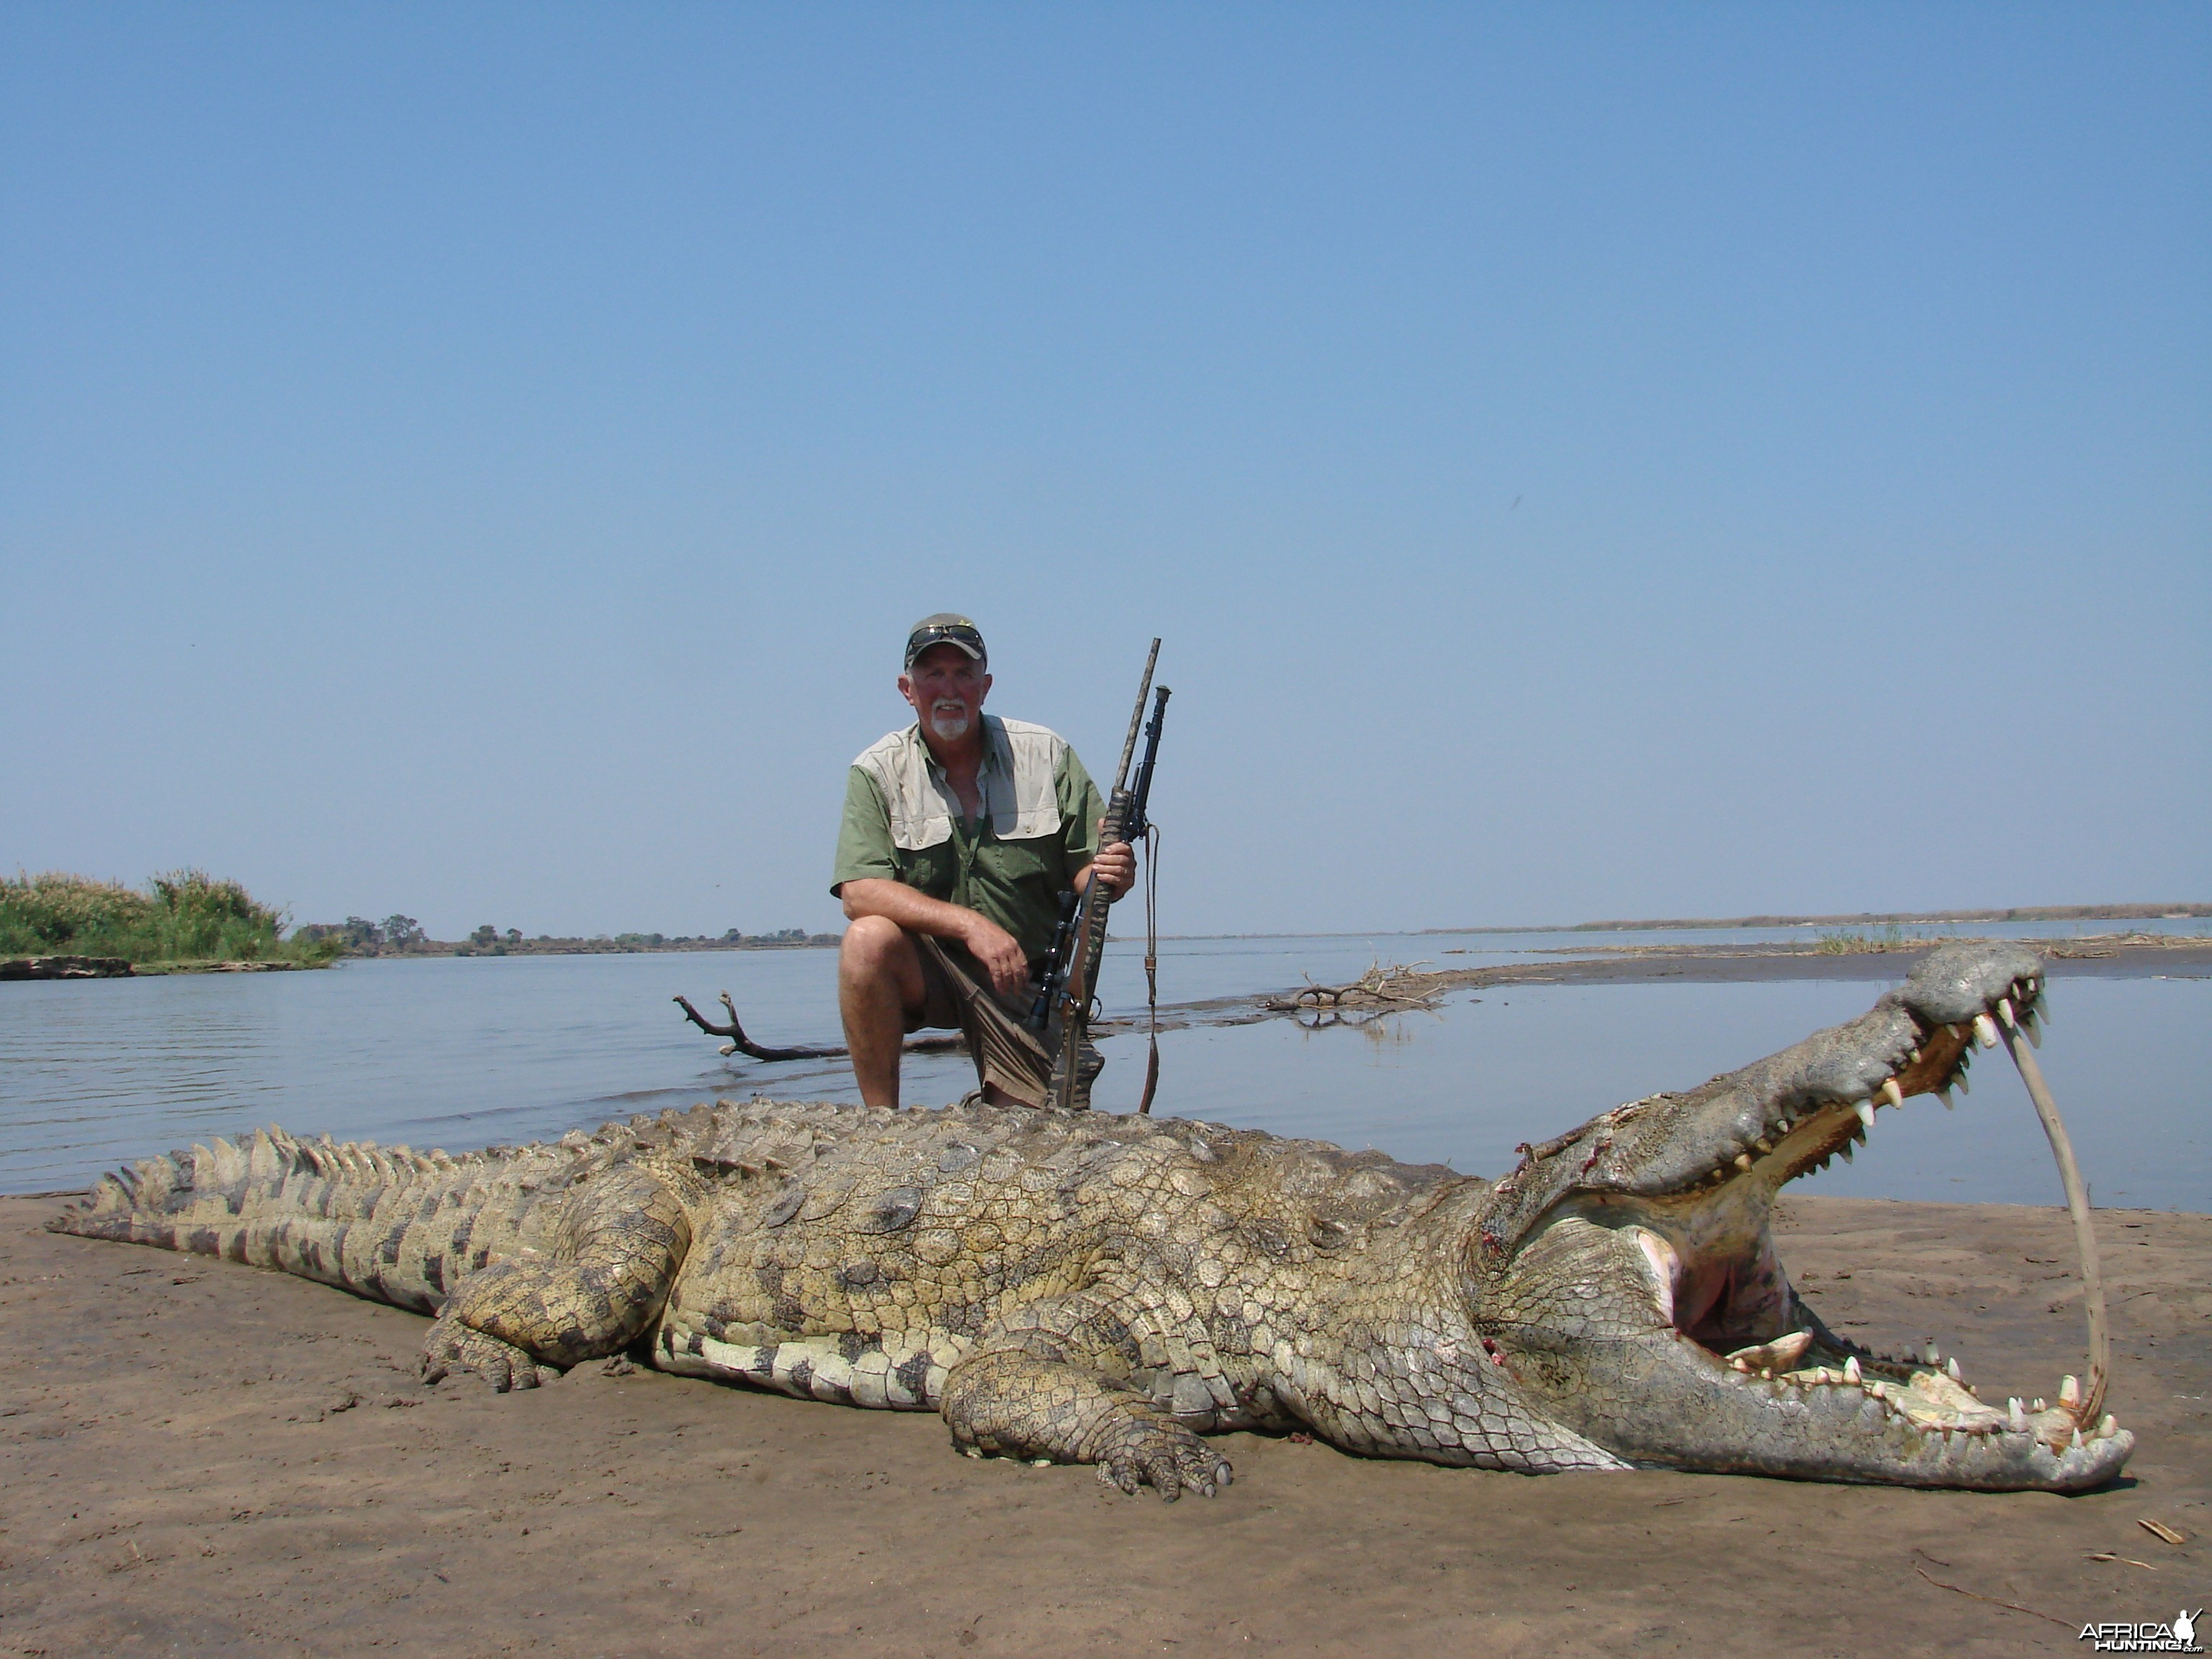 Great croc!